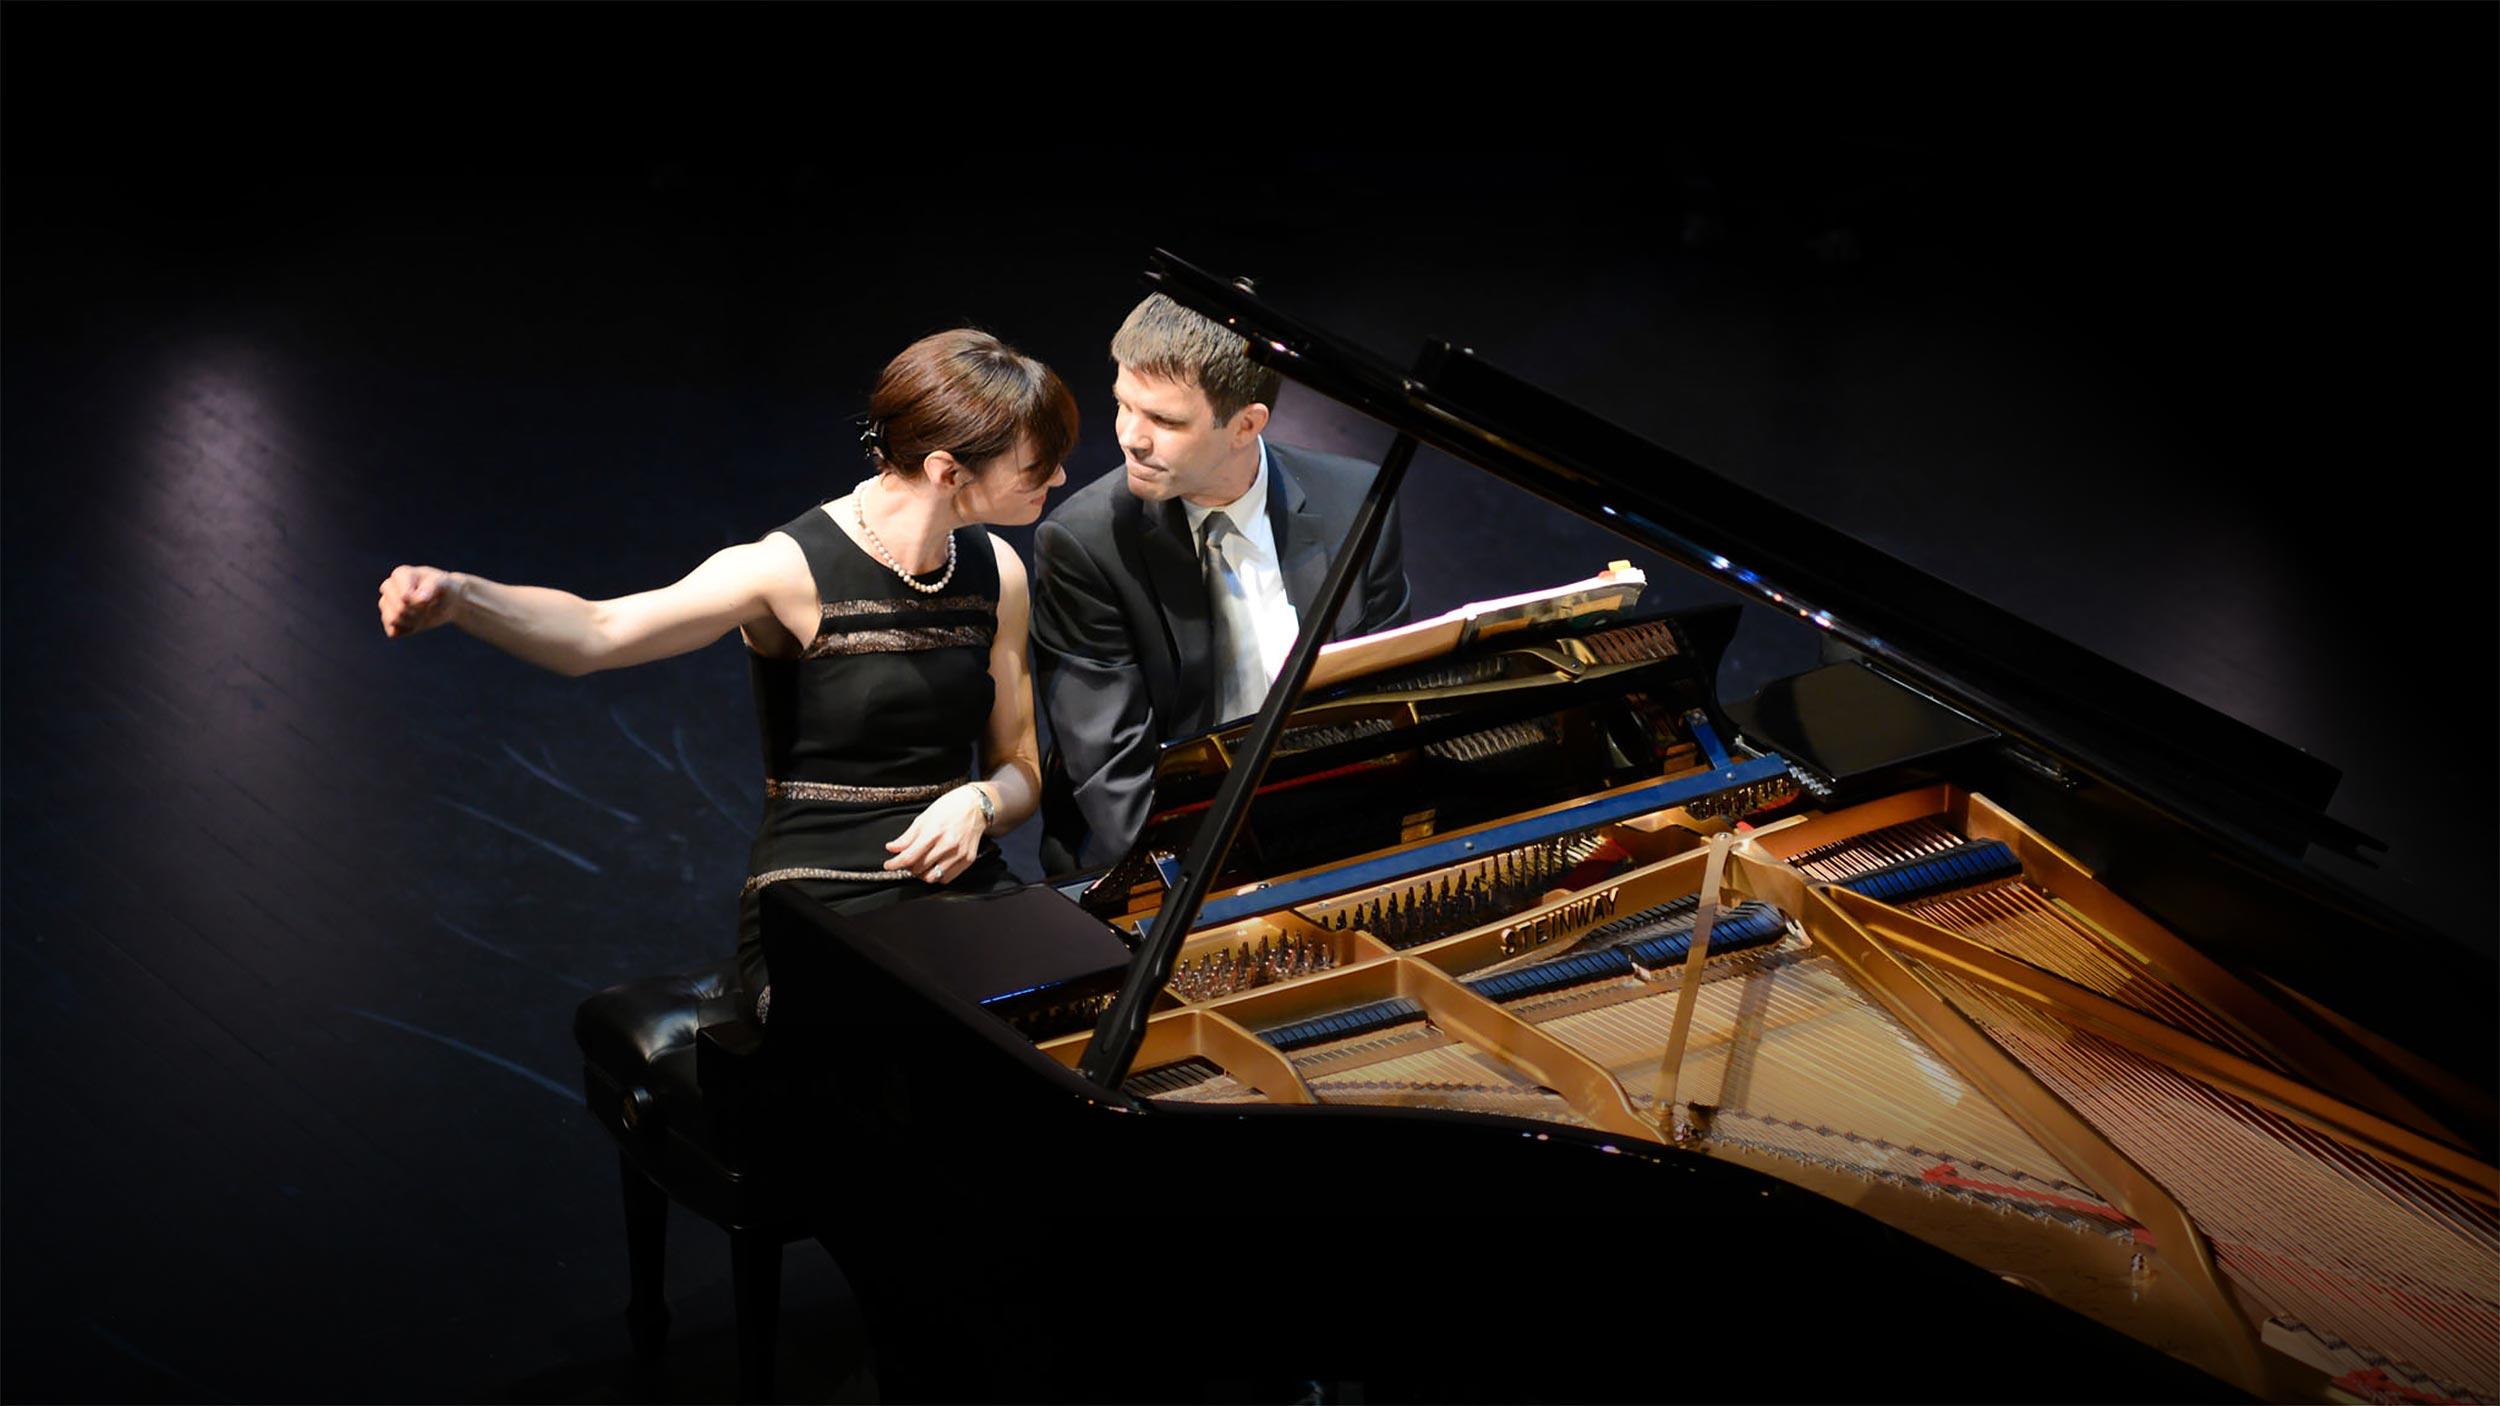 Lomazov Rackers piano duo playing piano